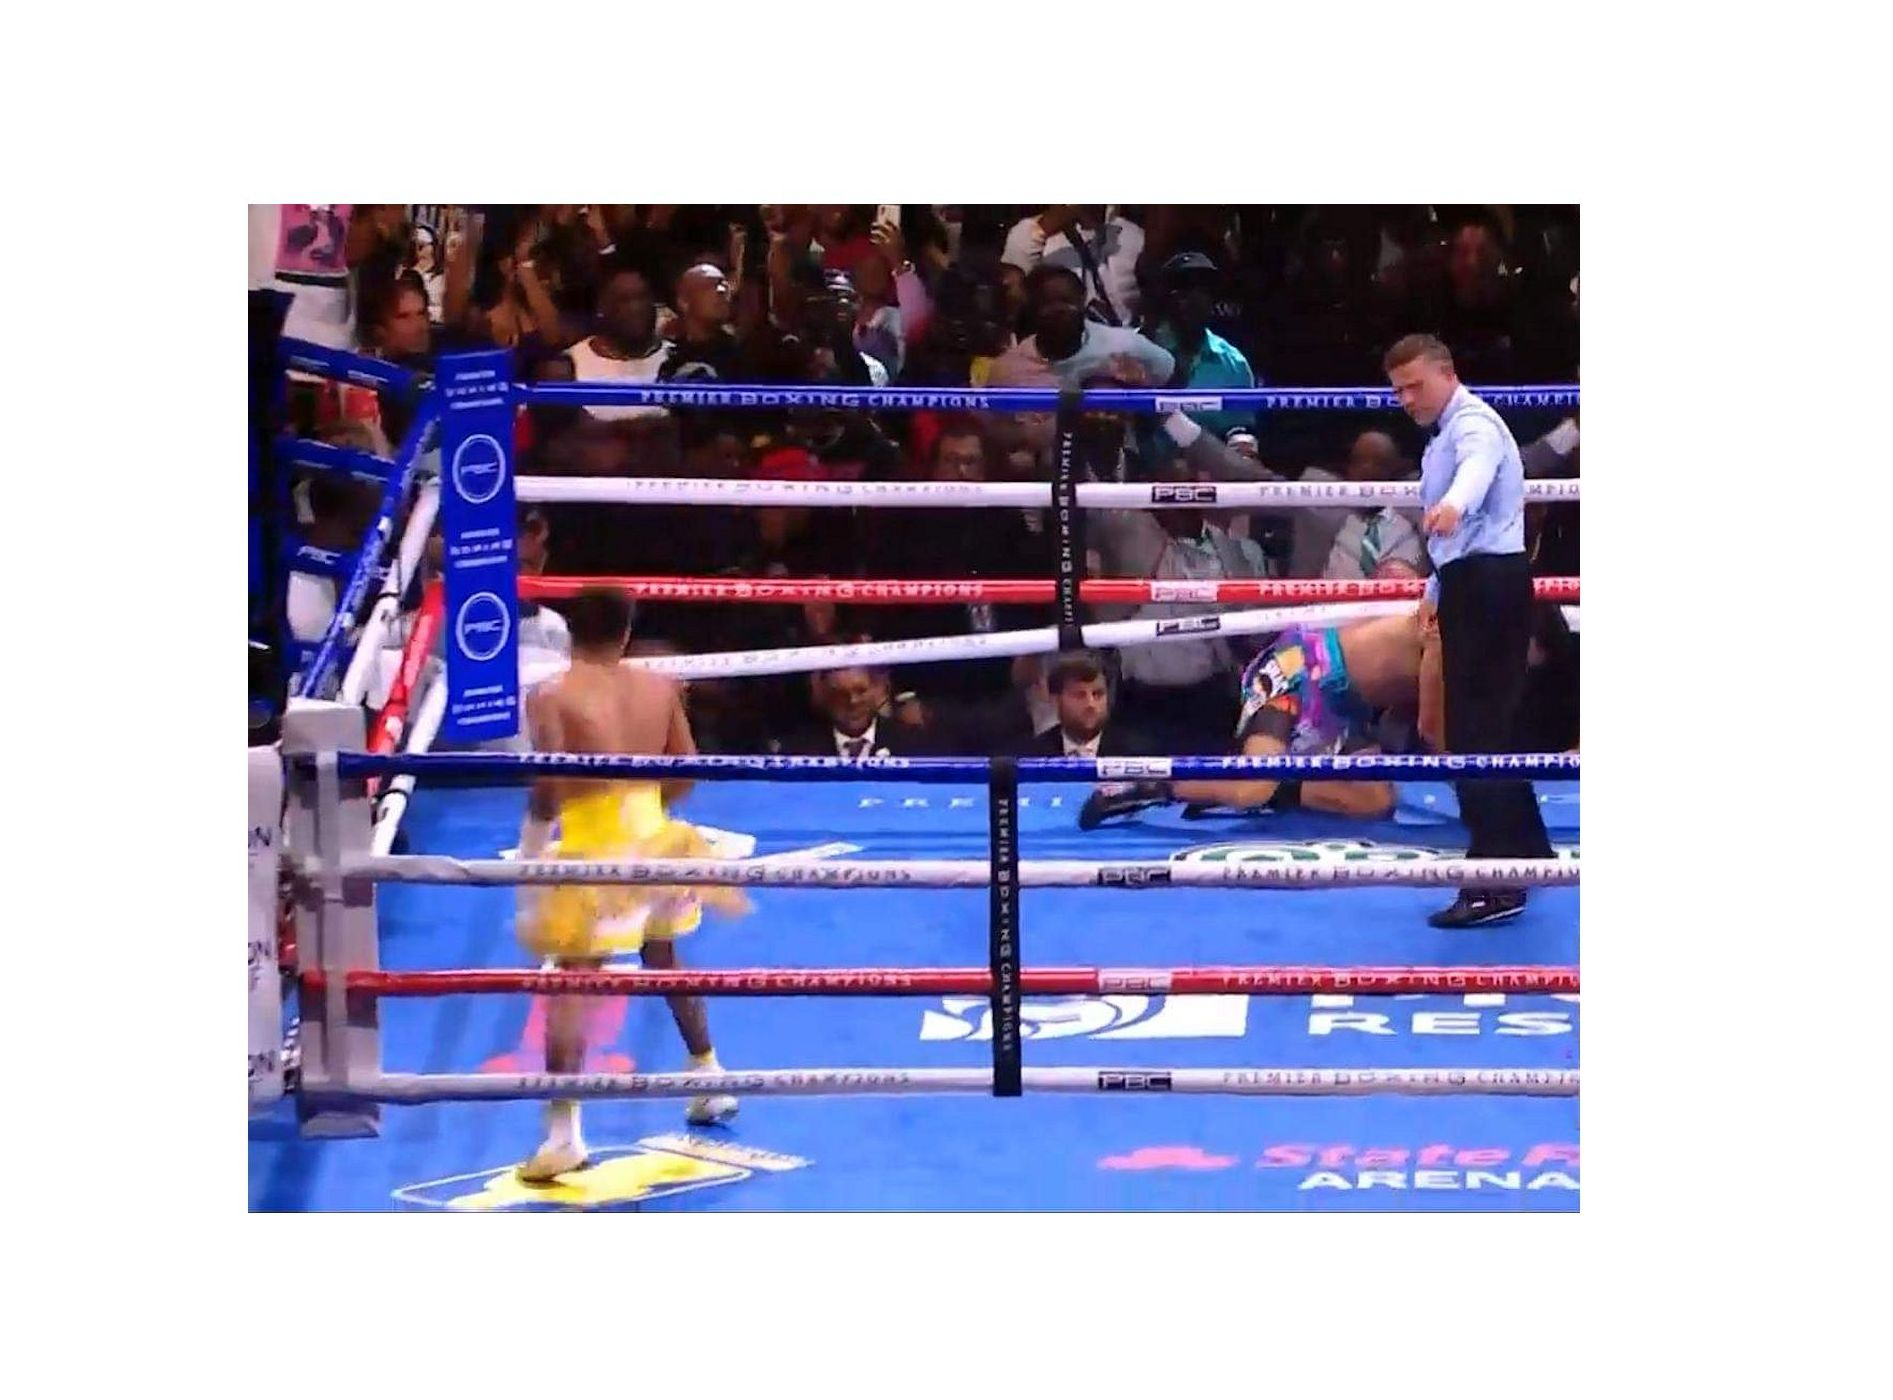 Gervonta Davis Fight - Cfrj4utmq Oqjm